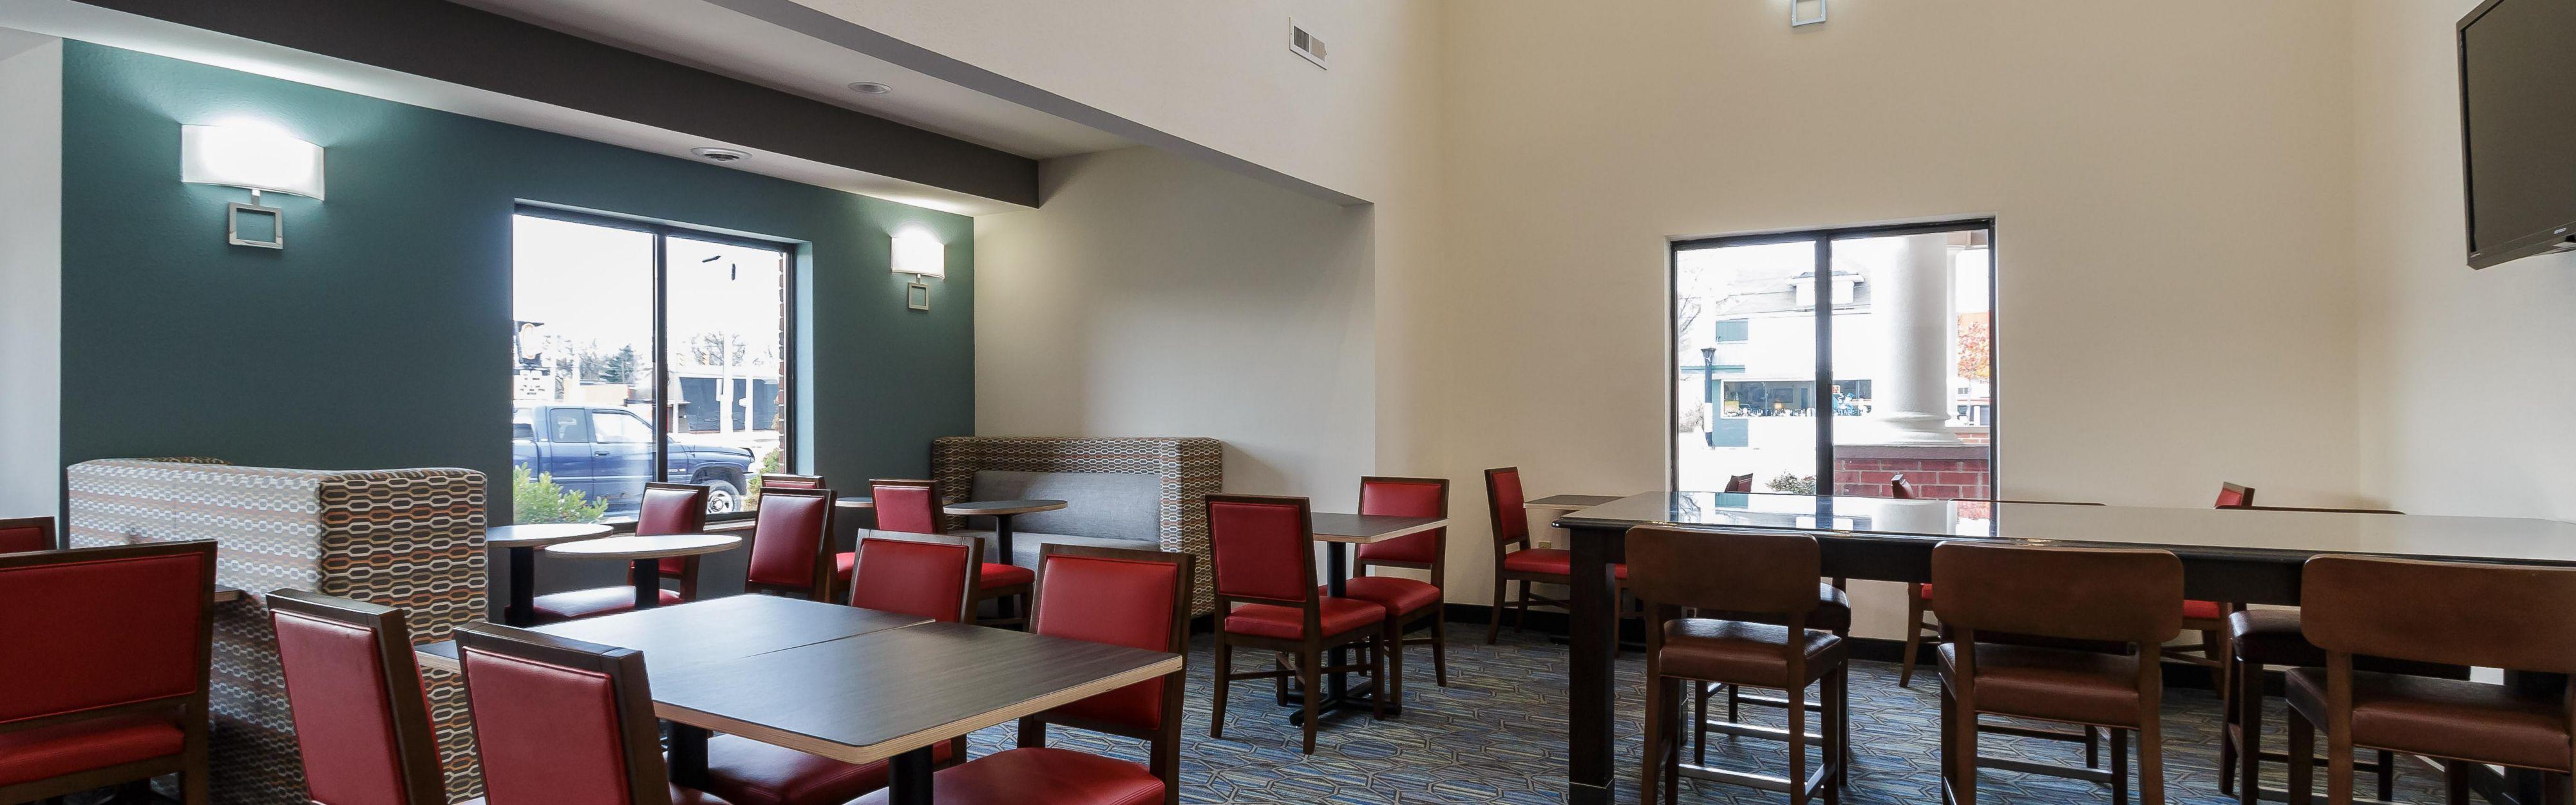 Holiday Inn Express & Suites South Bend - Notre Dame Univ. image 3